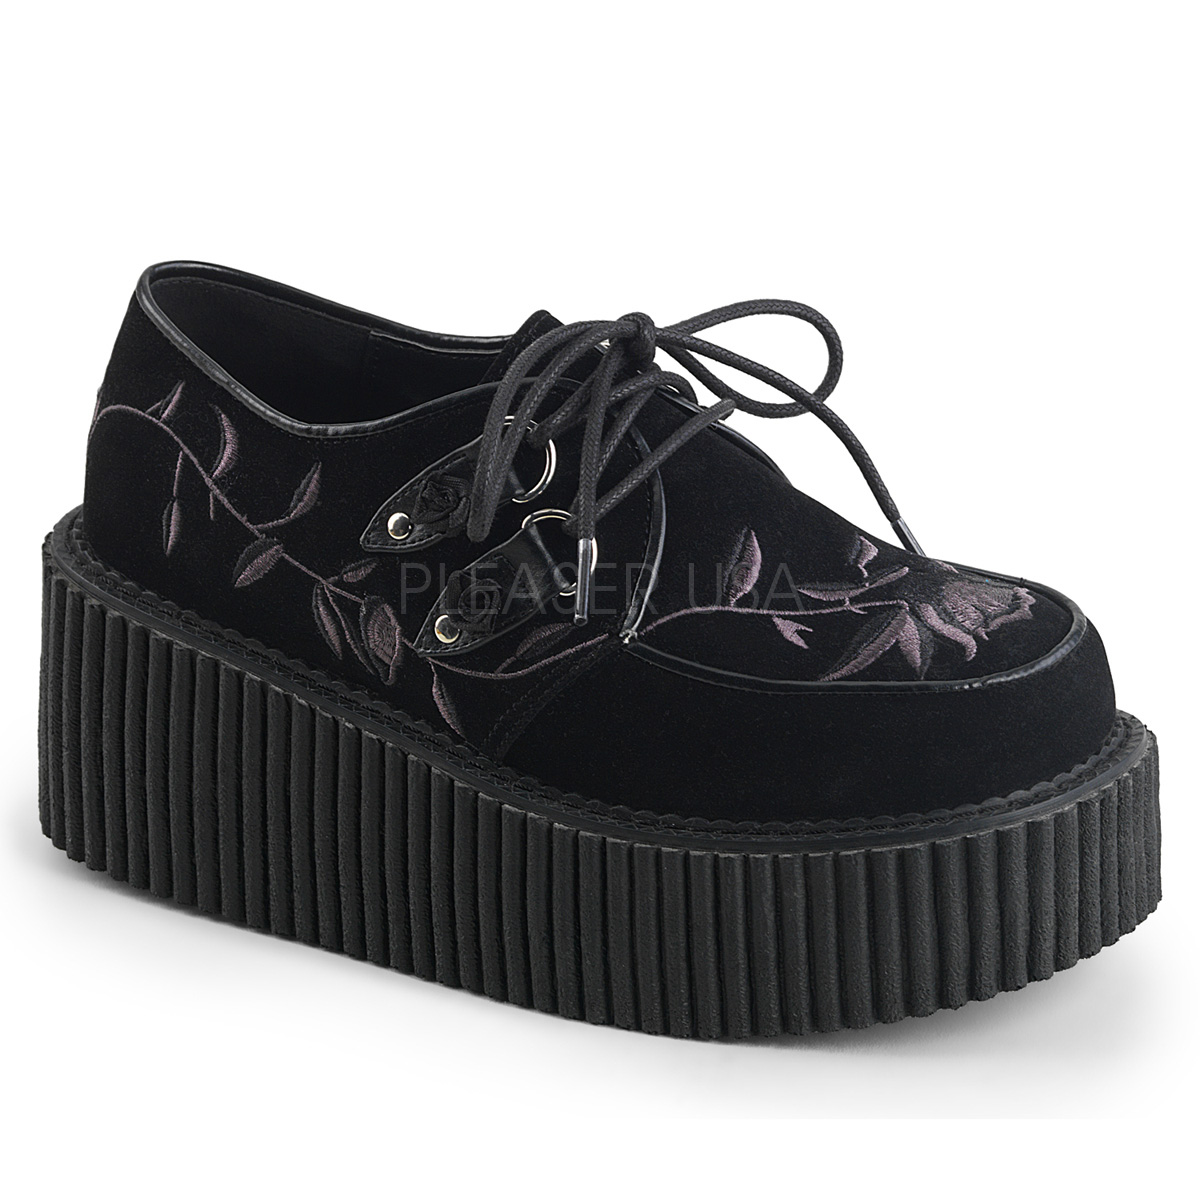 412790df080626 Velvet-7-5-cm-CREEPER-219-creepers-shoes-women-gothic-platform-shoes -10750 0.jpg